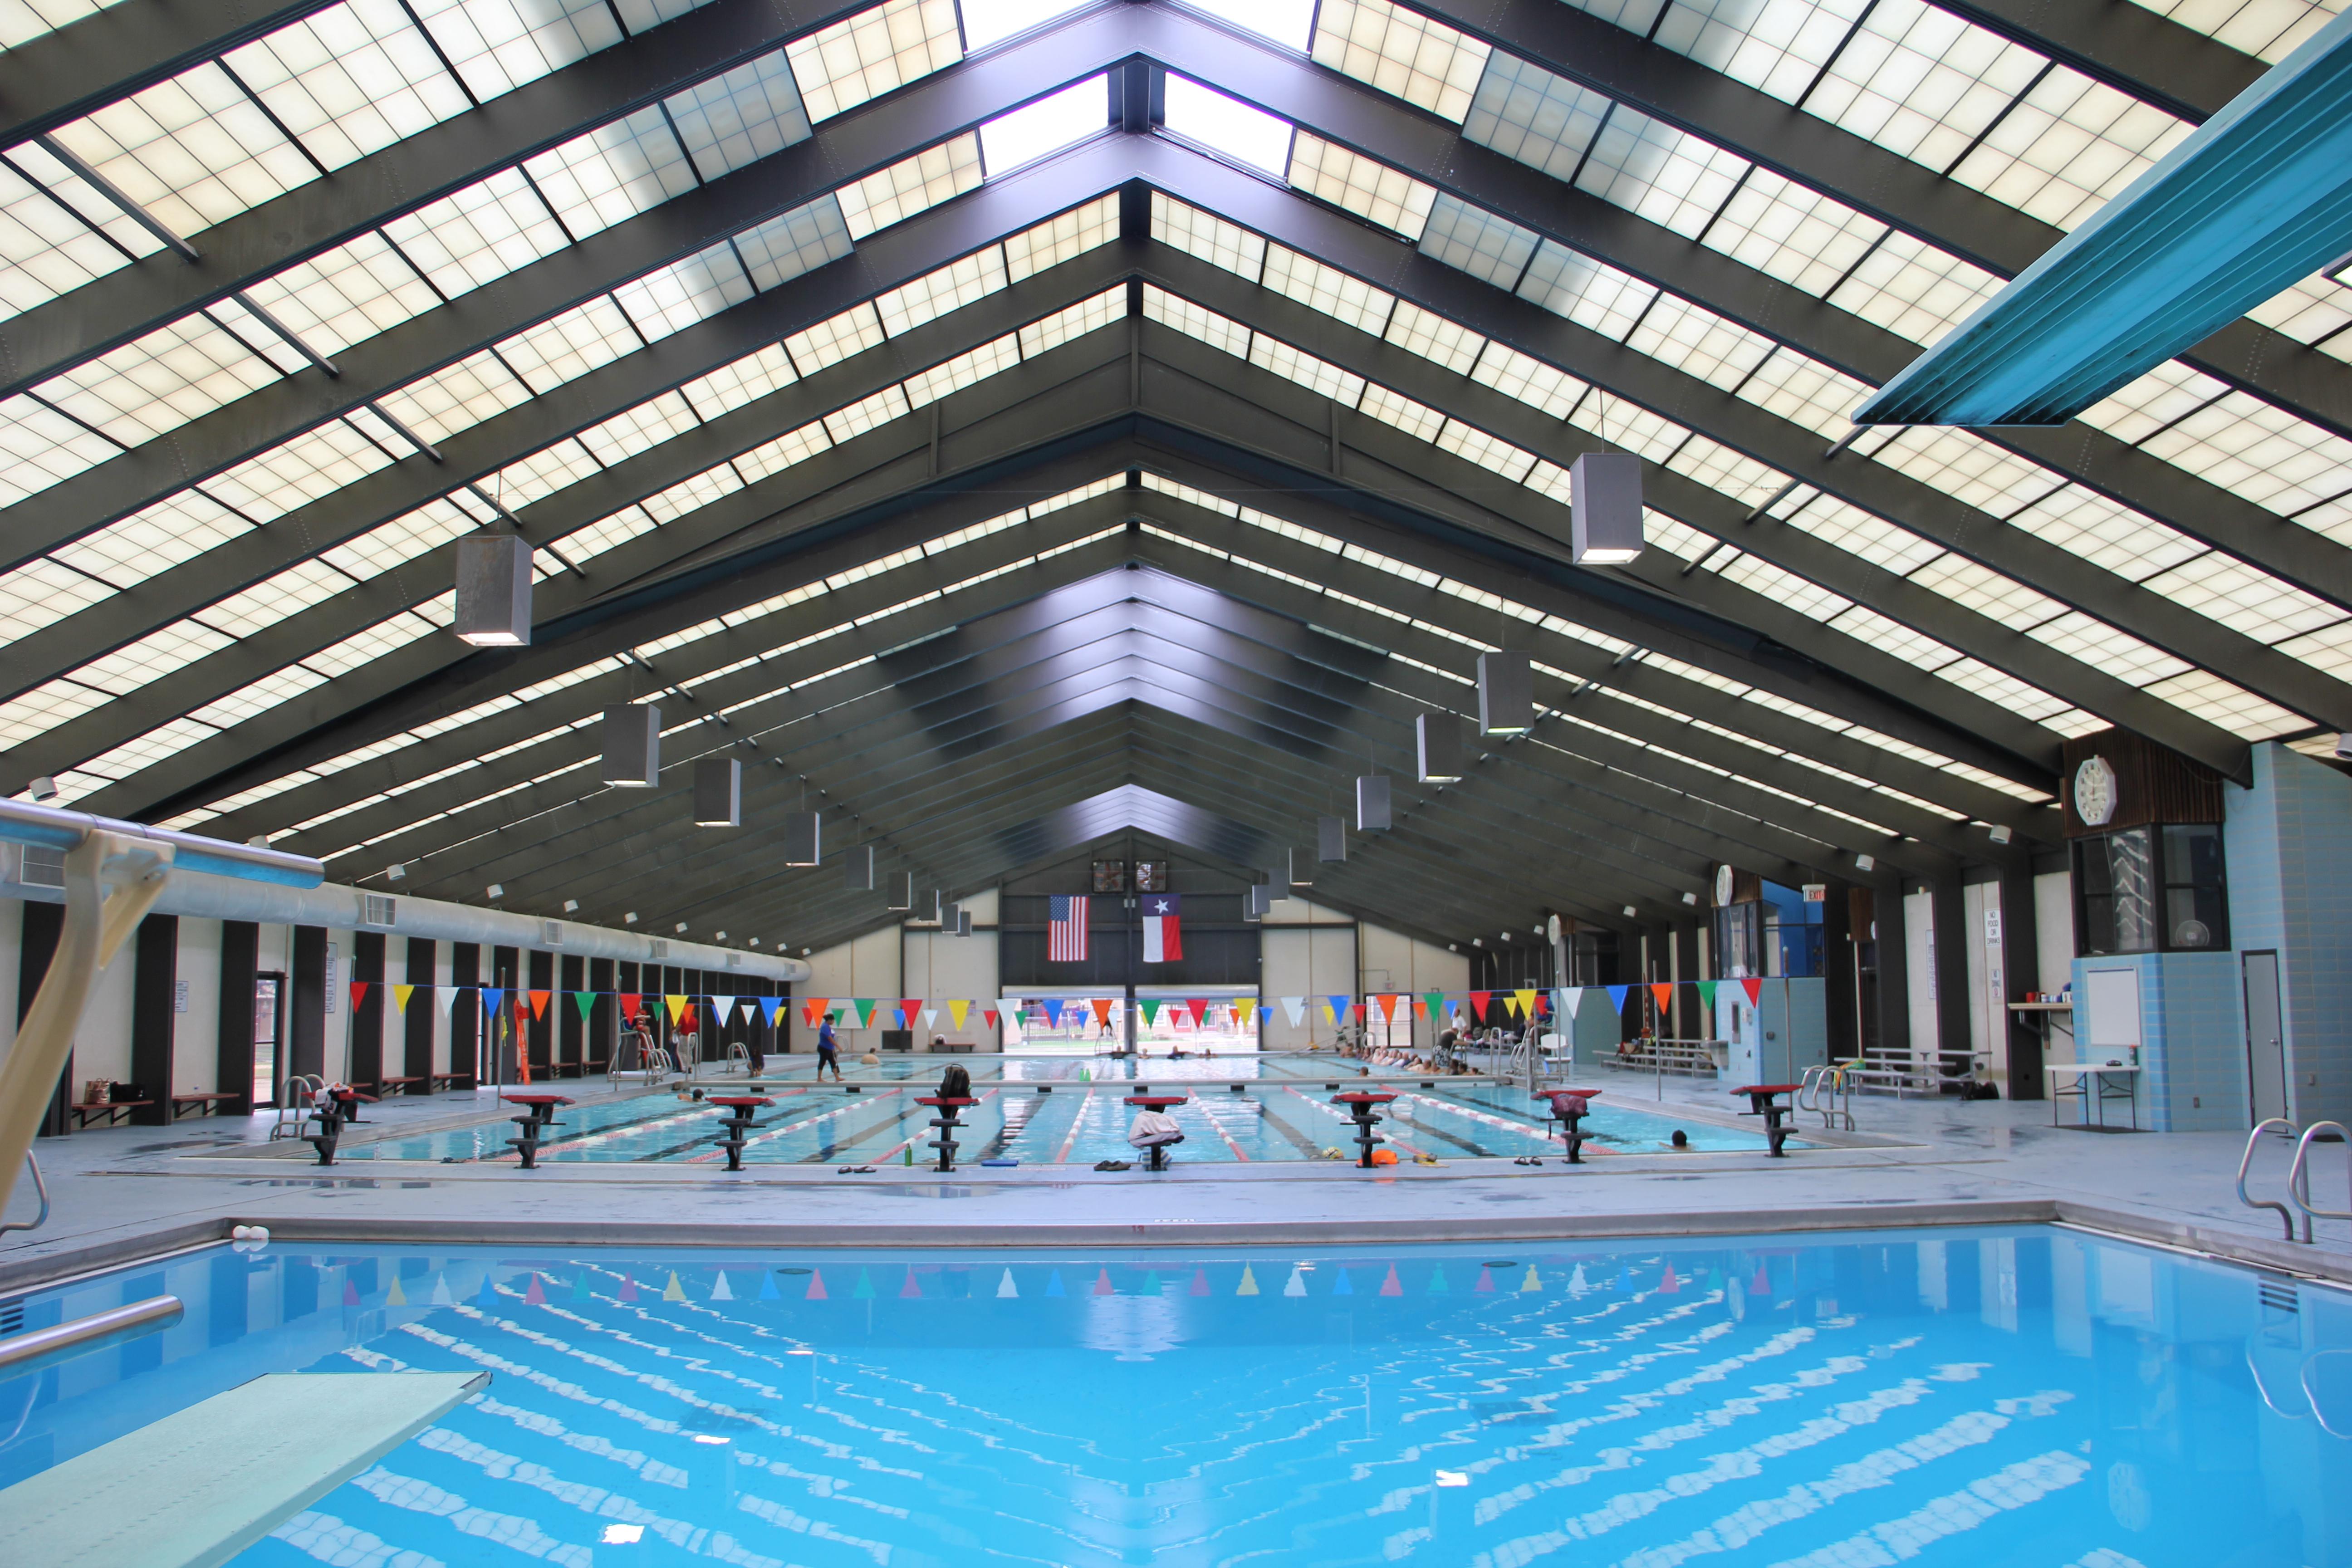 San antonio natatorium the city of san antonio official city website City of san antonio swimming pools